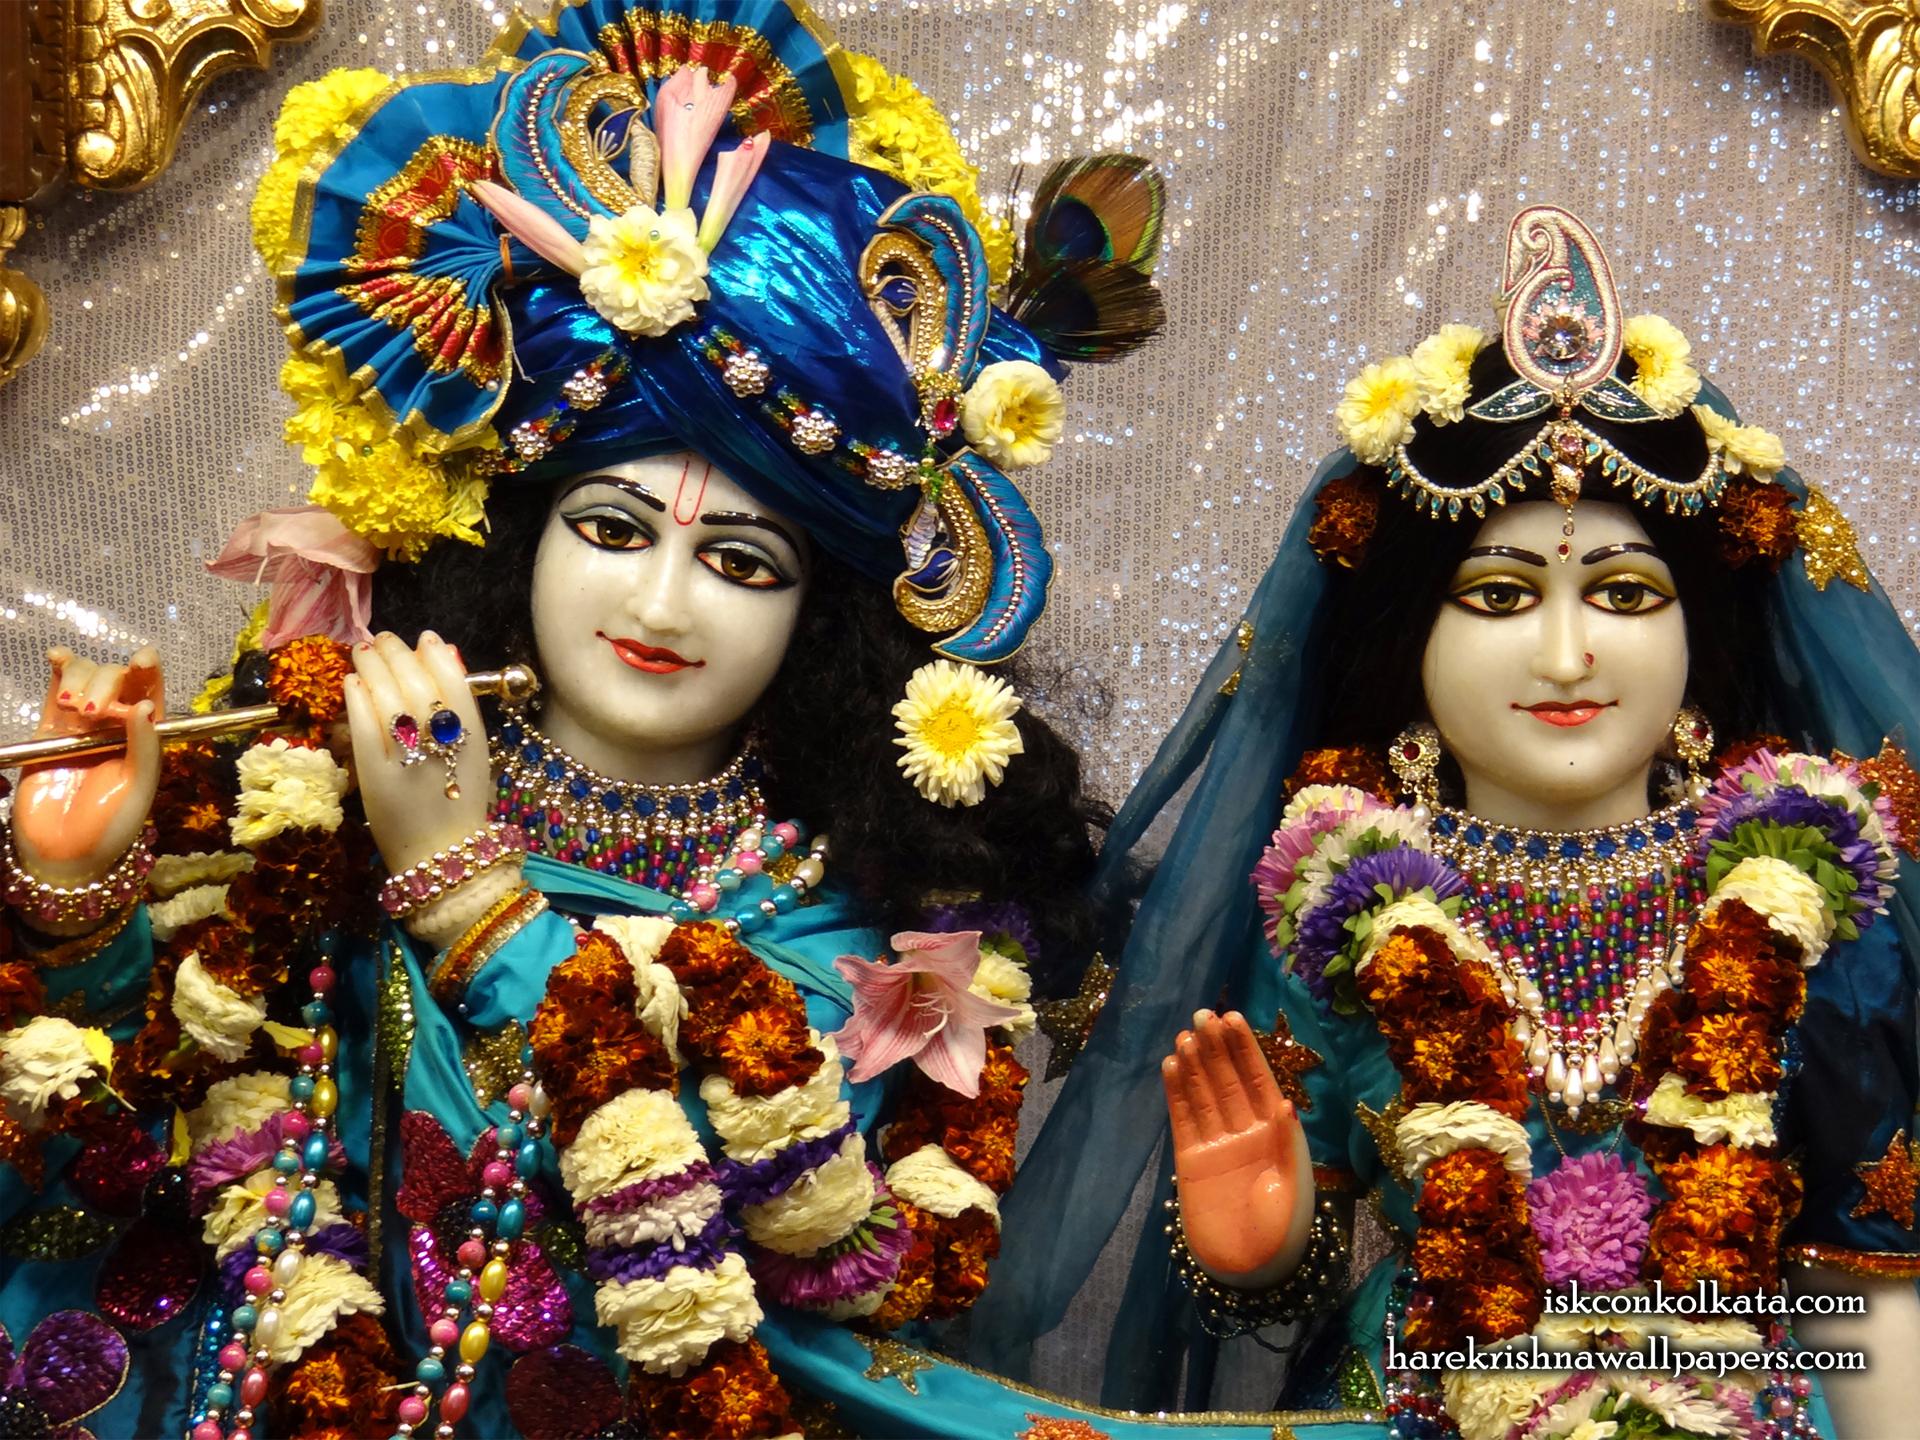 Sri Sri Radha Govinda Close up Wallpaper (007) Size 1920x1440 Download